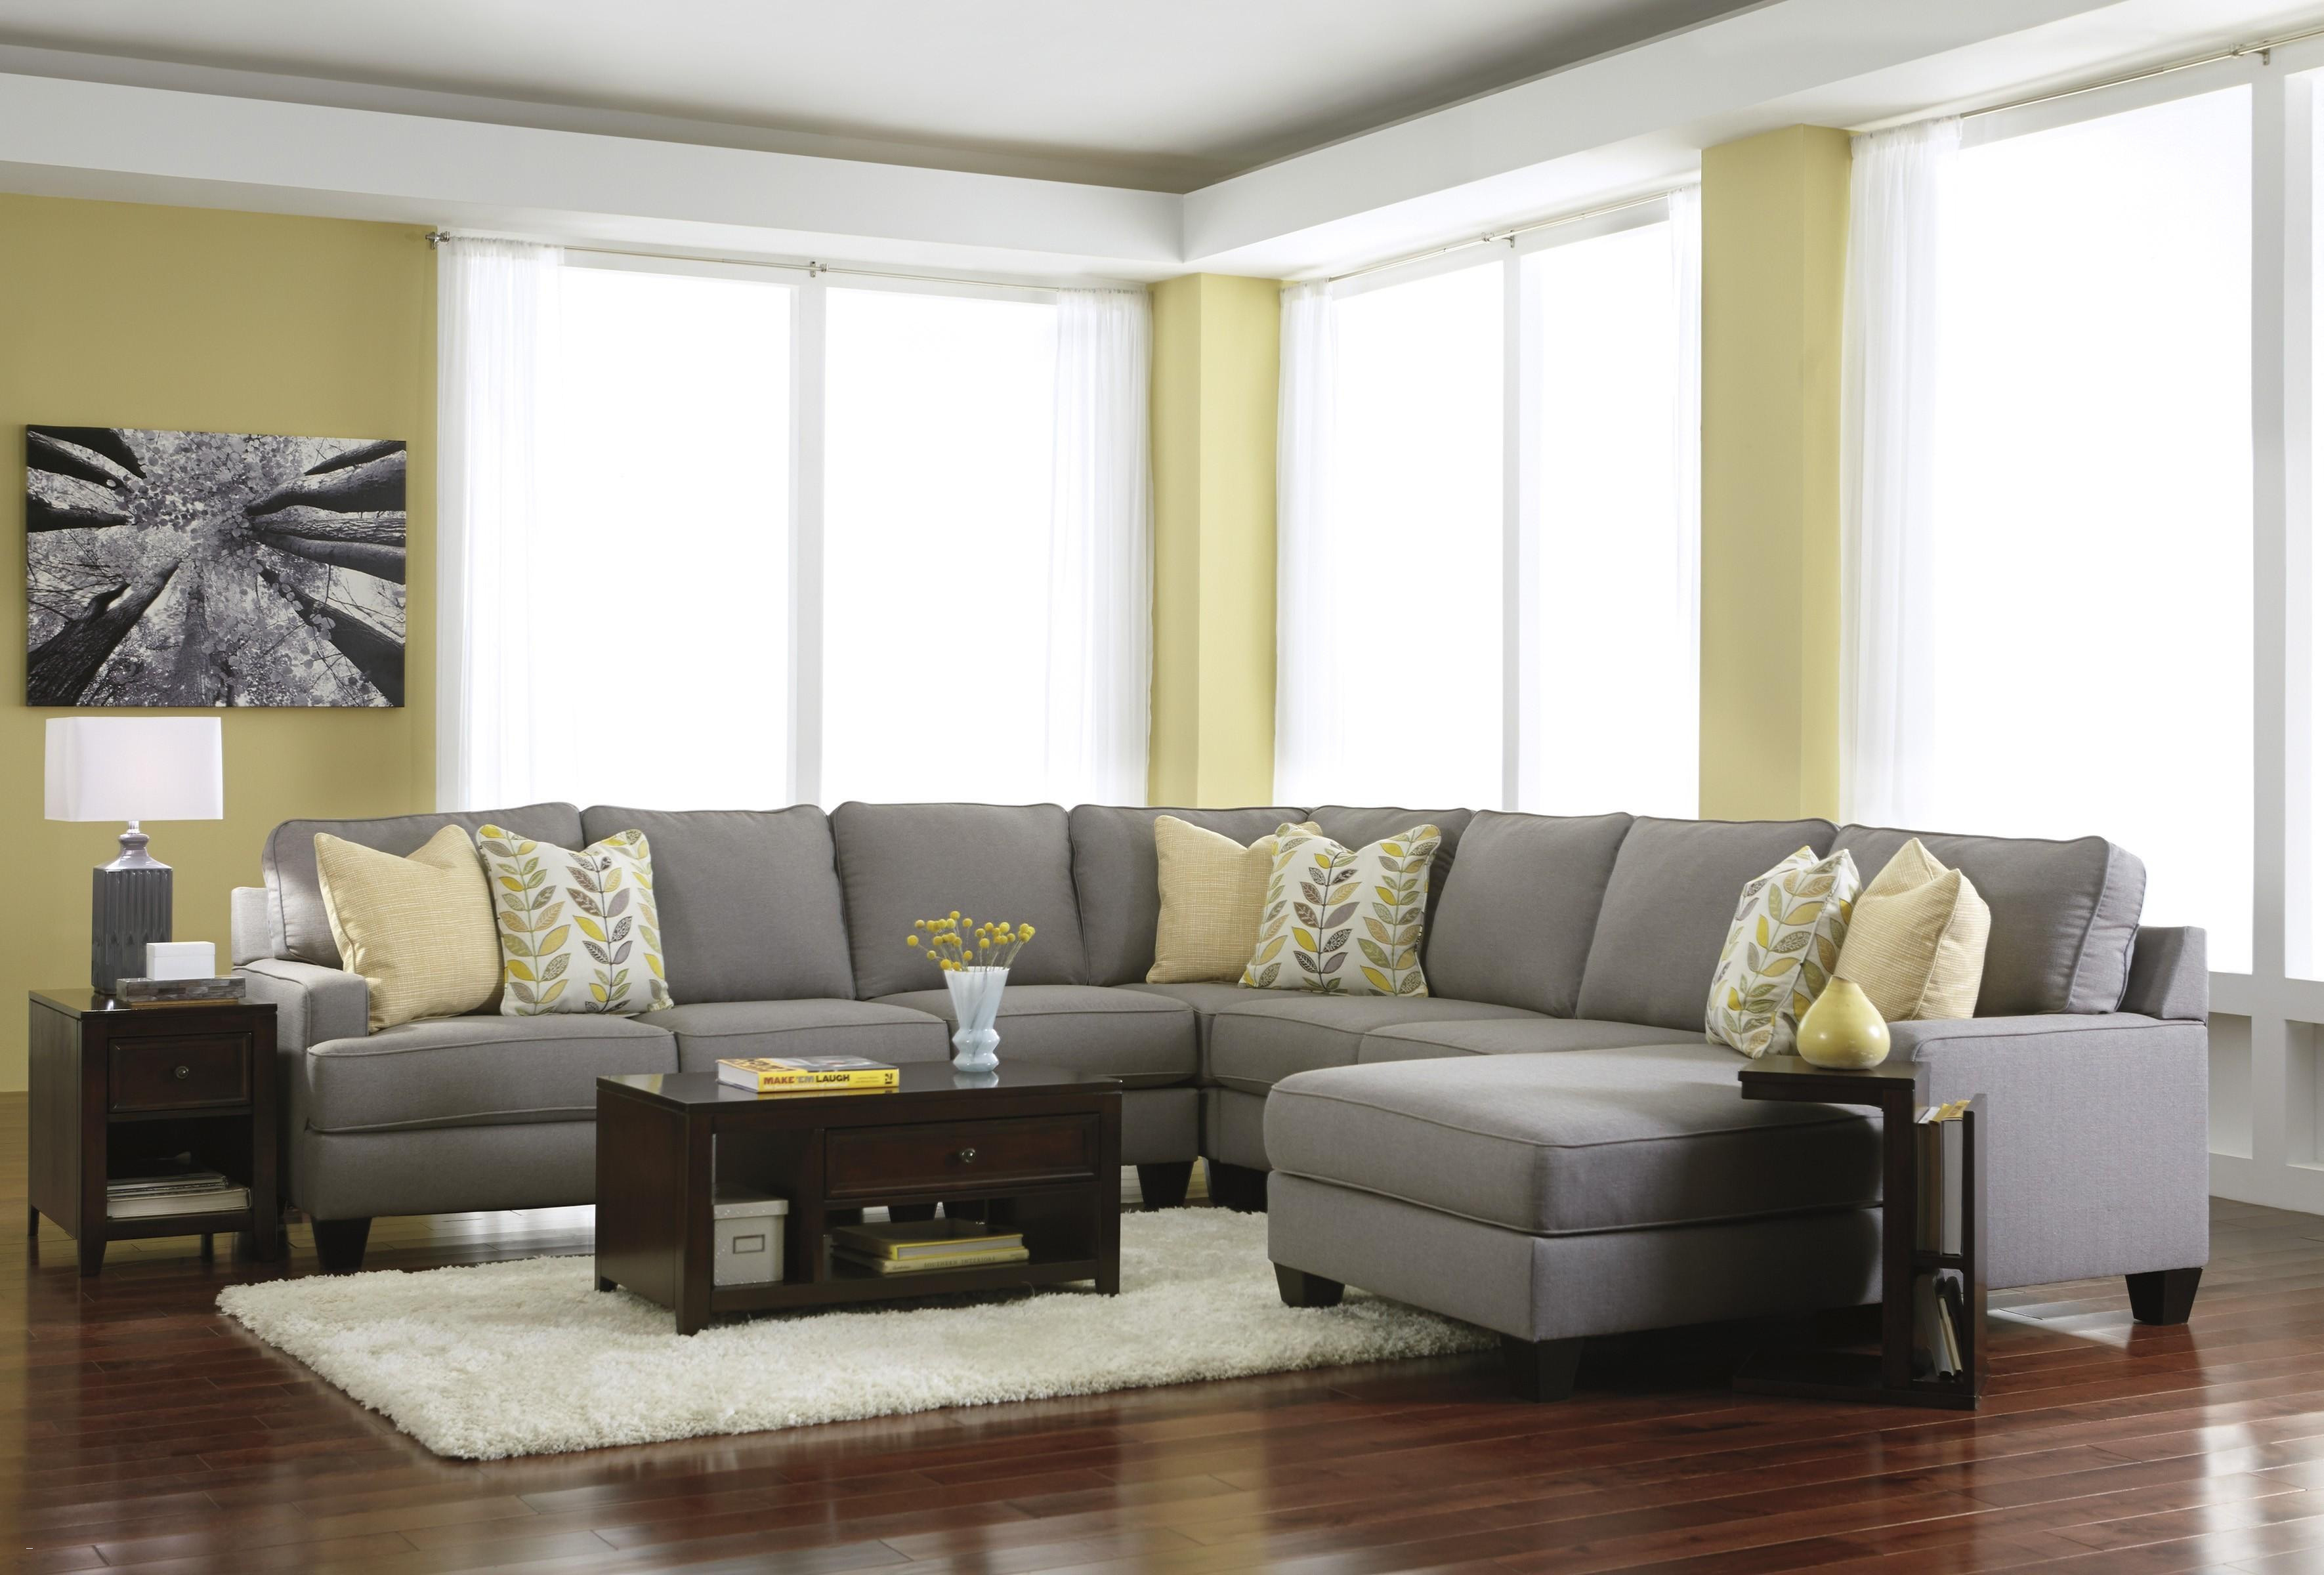 dark hardwood floor living room ideas of diy outdoor furniture plans regarding living room table designs fresh furniture dark grey couch inspirational wicker outdoor sofa 0d